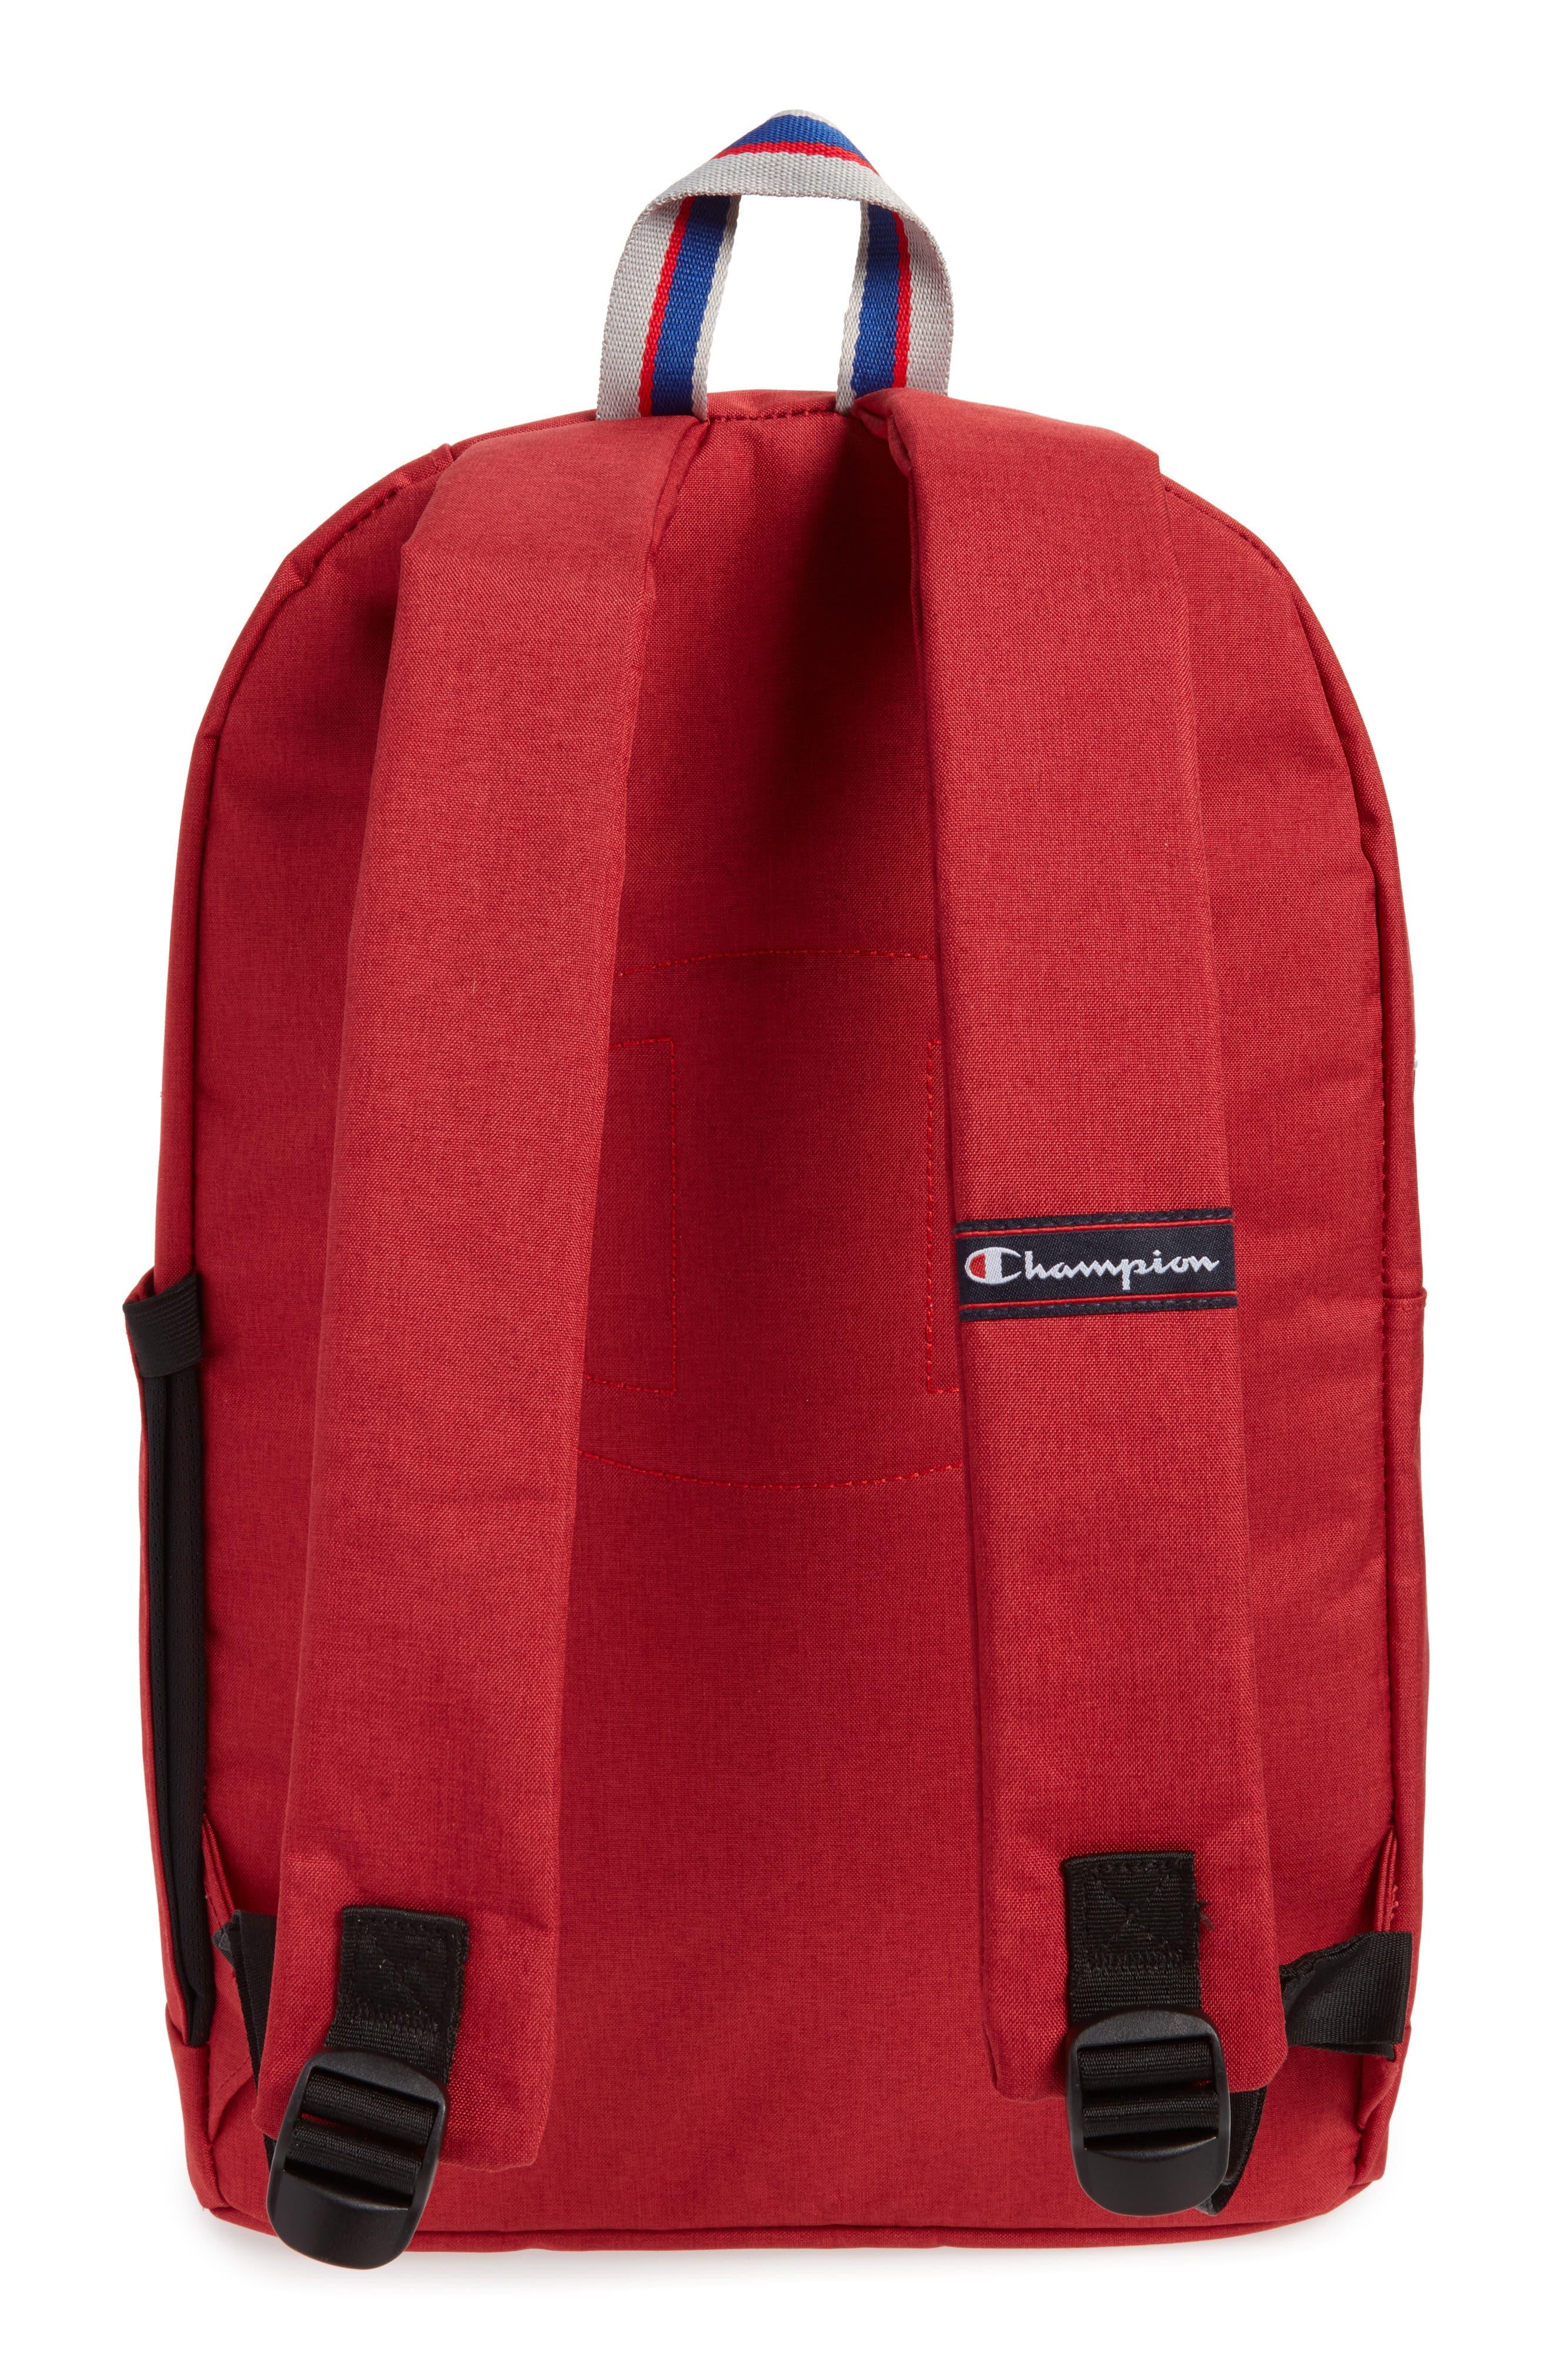 Supercize Backpack,                             Alternate thumbnail 3, color,                             SCARLET HEATHER